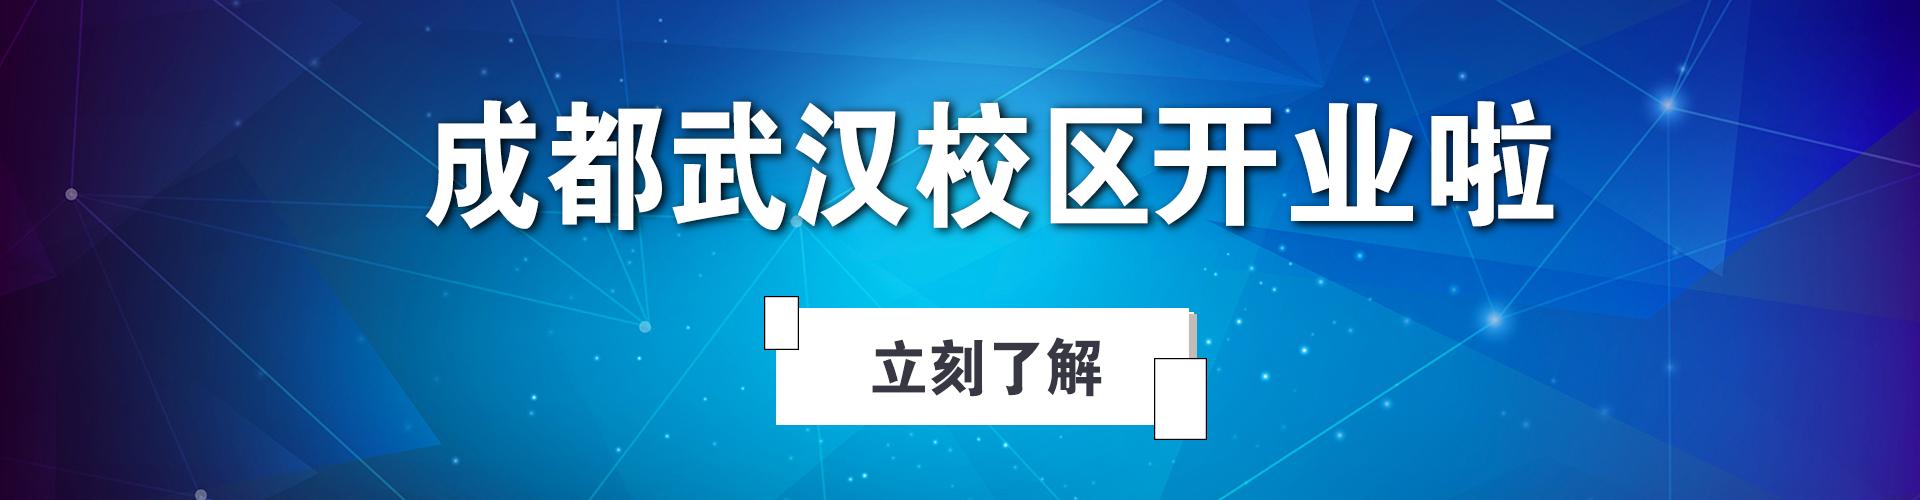 python开发培训,app测试培训,java培训,成都武汉校区开班啦